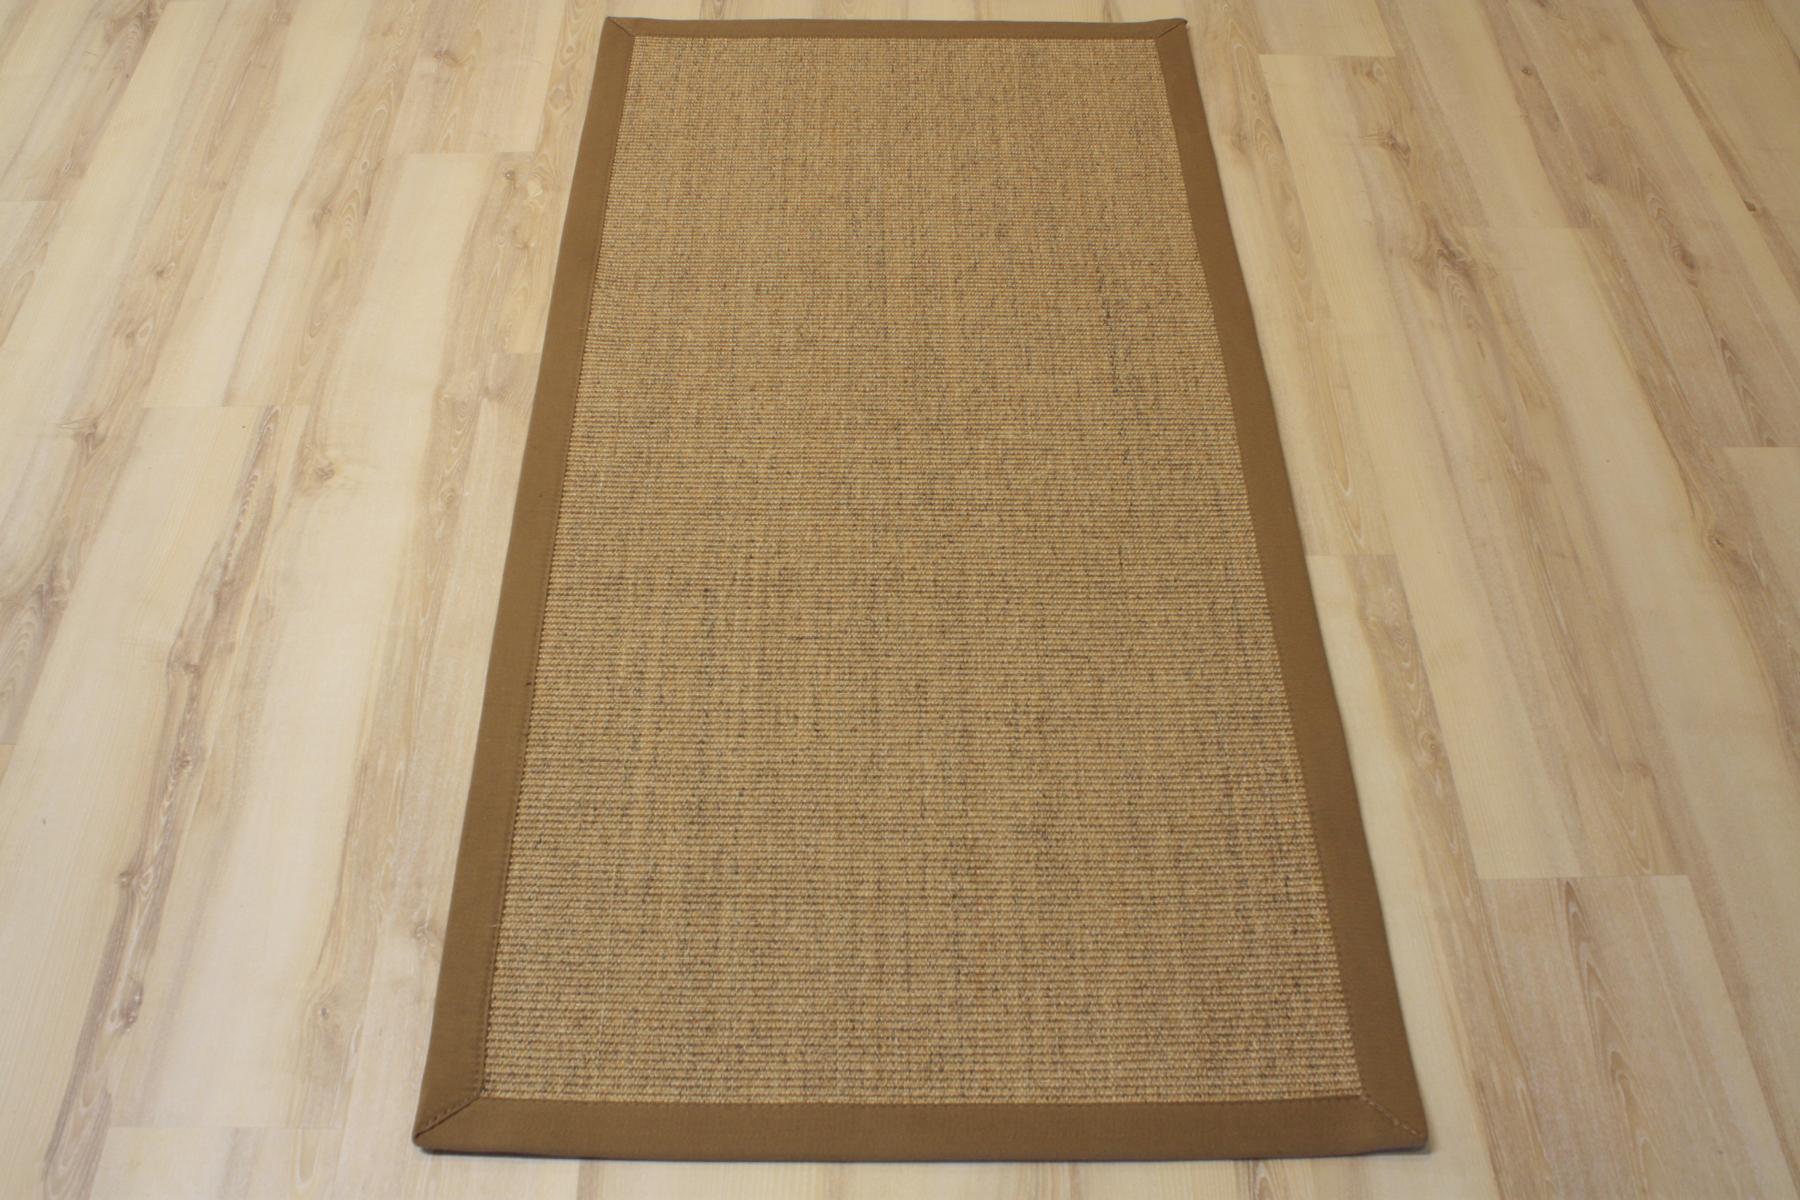 sisal teppich manaus mit bord re jaspe 300x400 cm 100 sisal spedition ebay. Black Bedroom Furniture Sets. Home Design Ideas